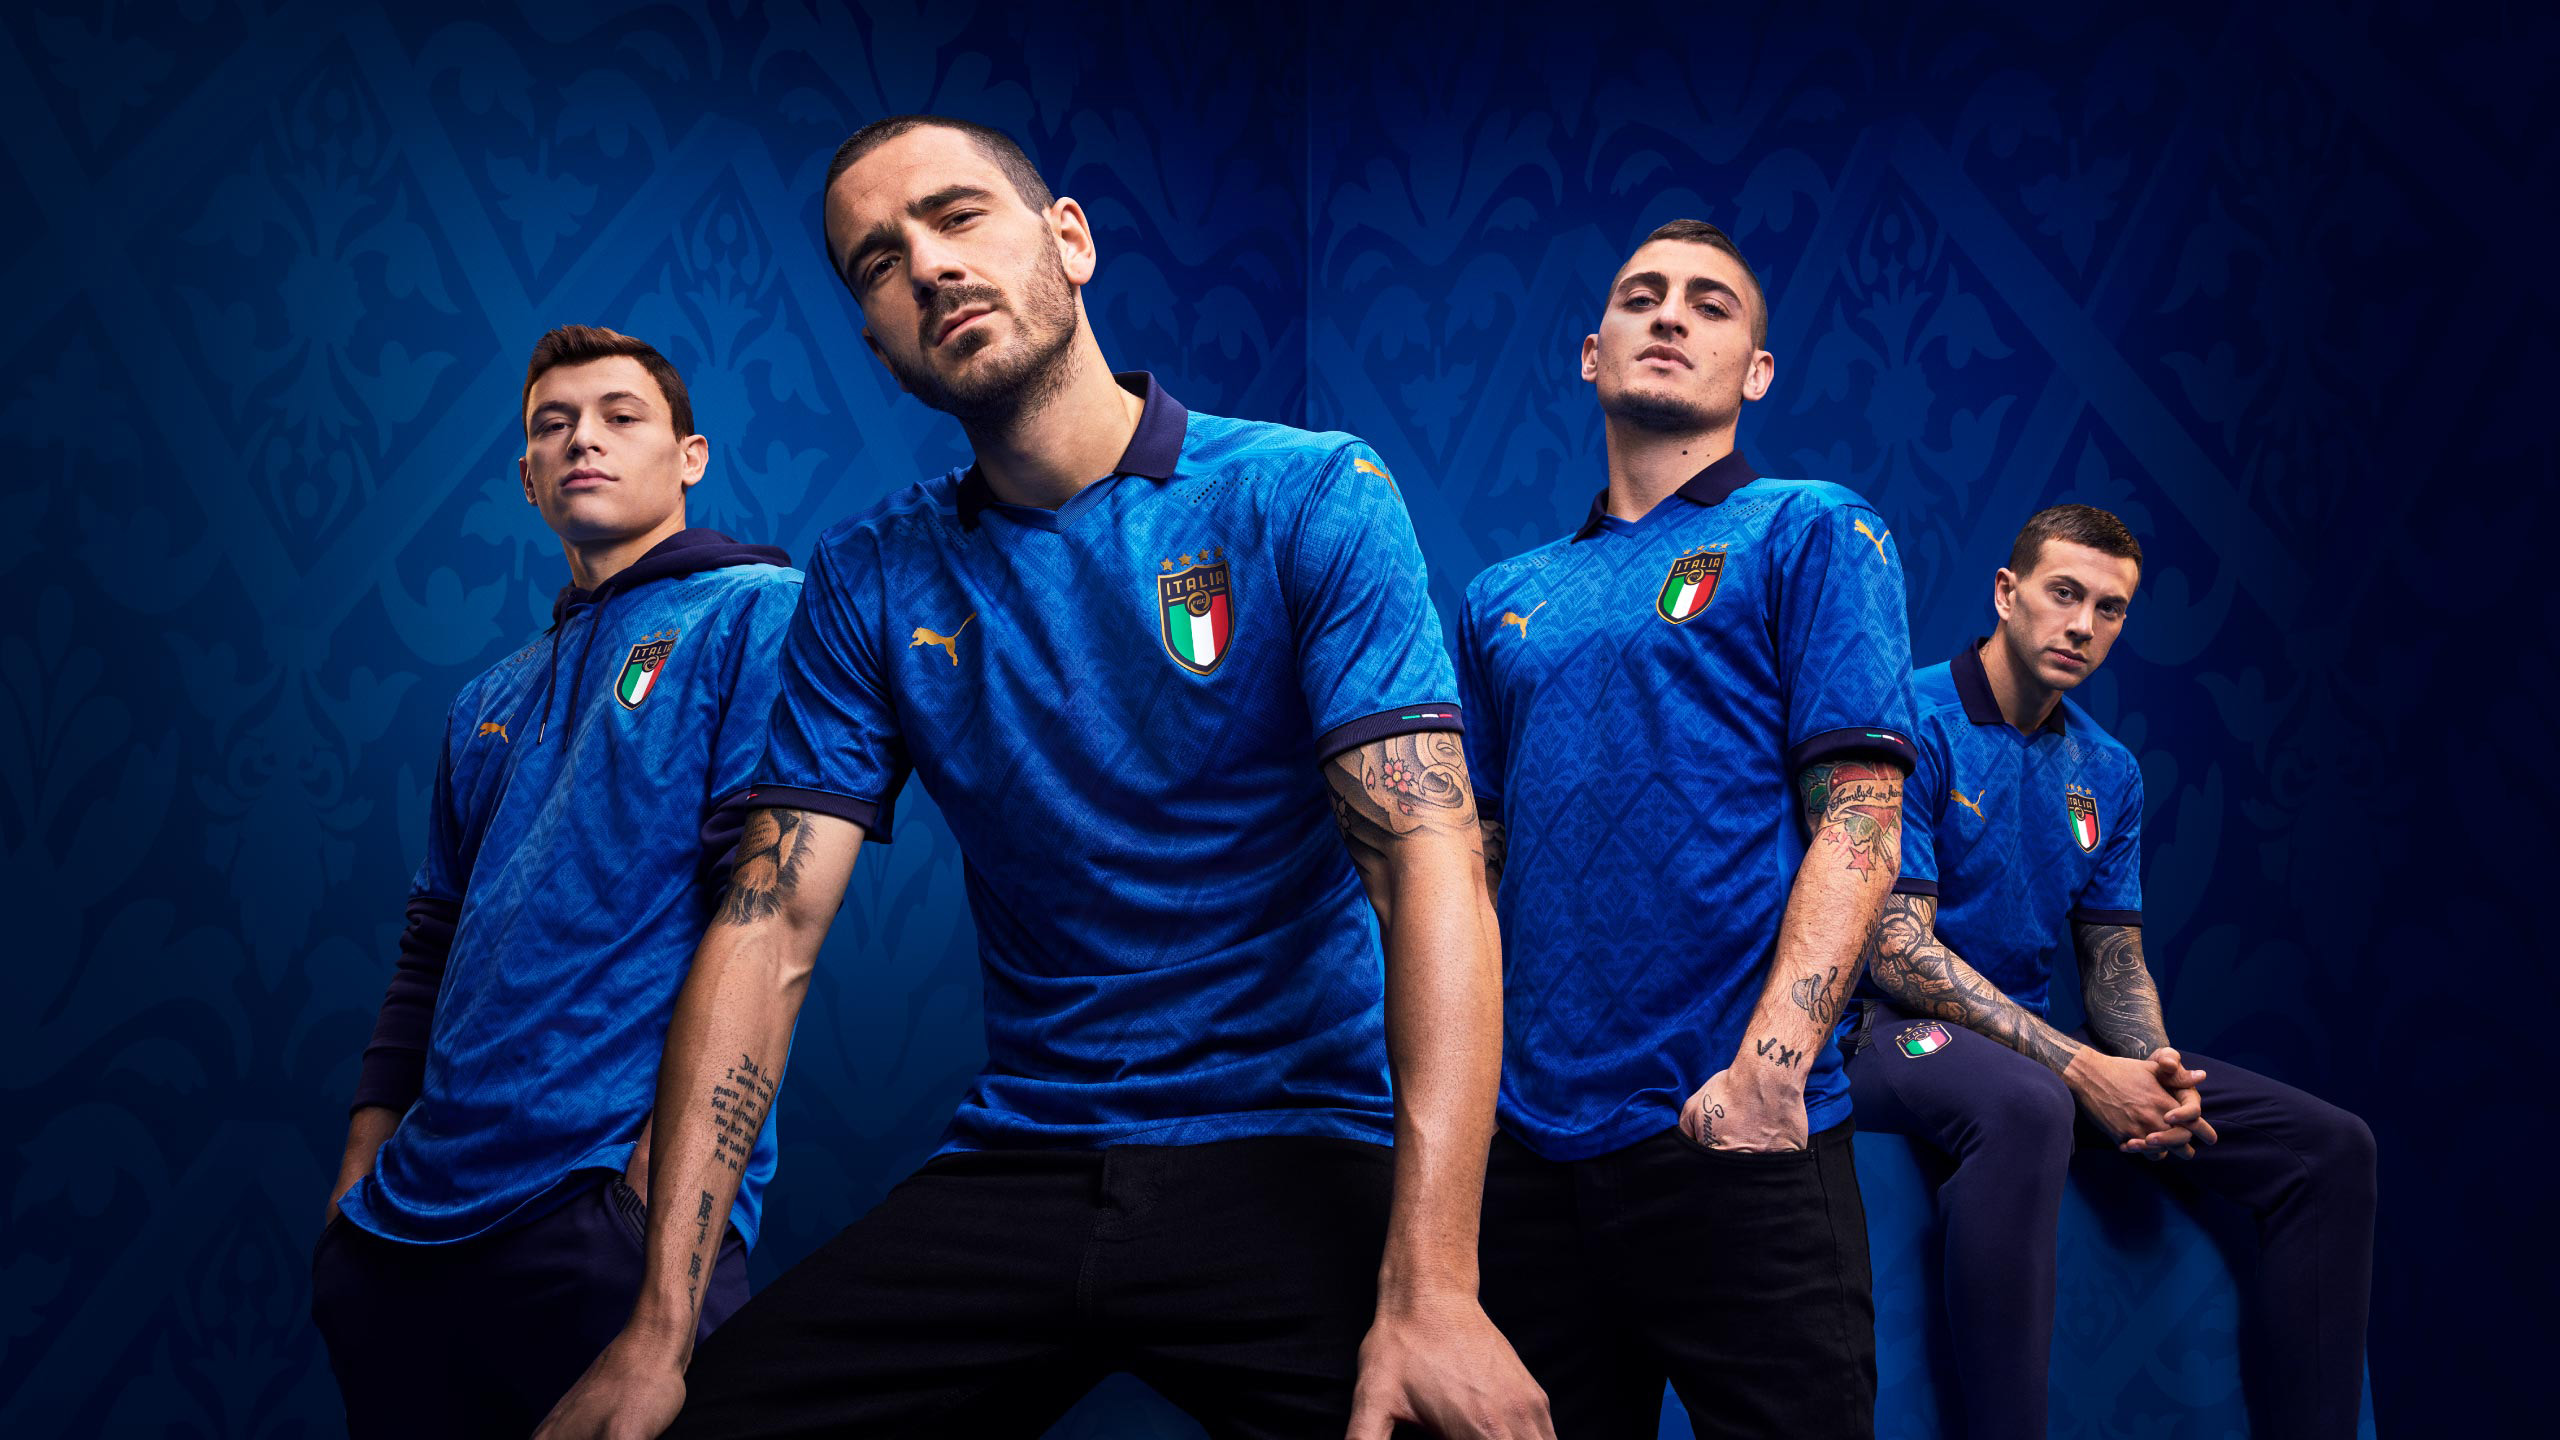 20SS_PR_TS_Football_National-Team_Home-Shirt_2560x1440px_Athletes_Italy